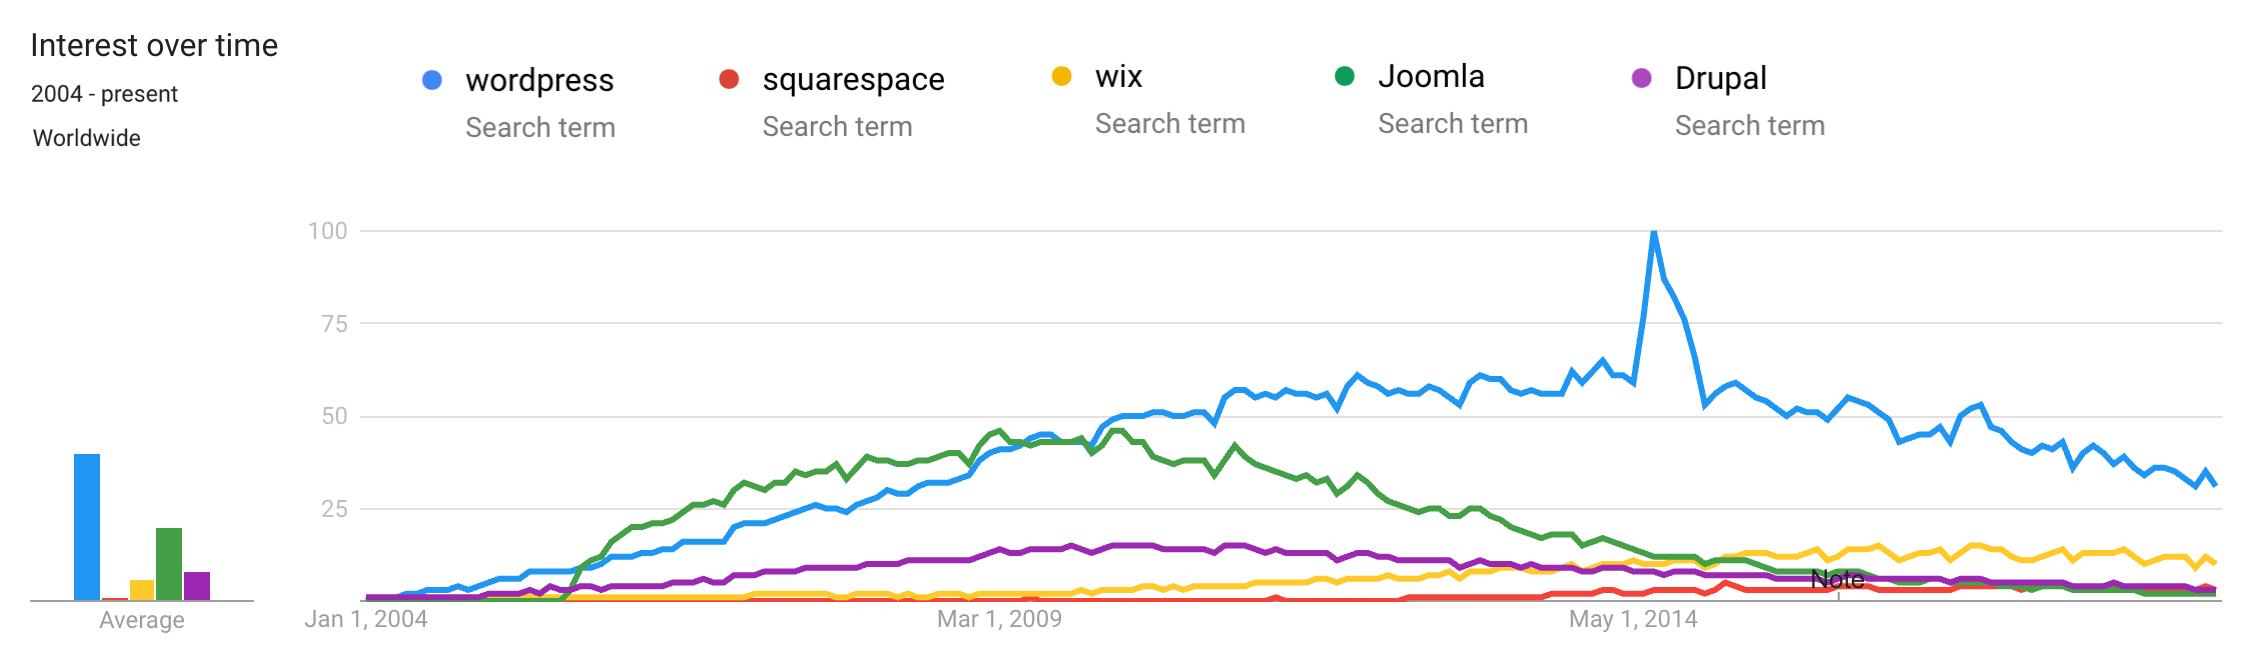 WordPress-Trends vs. andere CMS